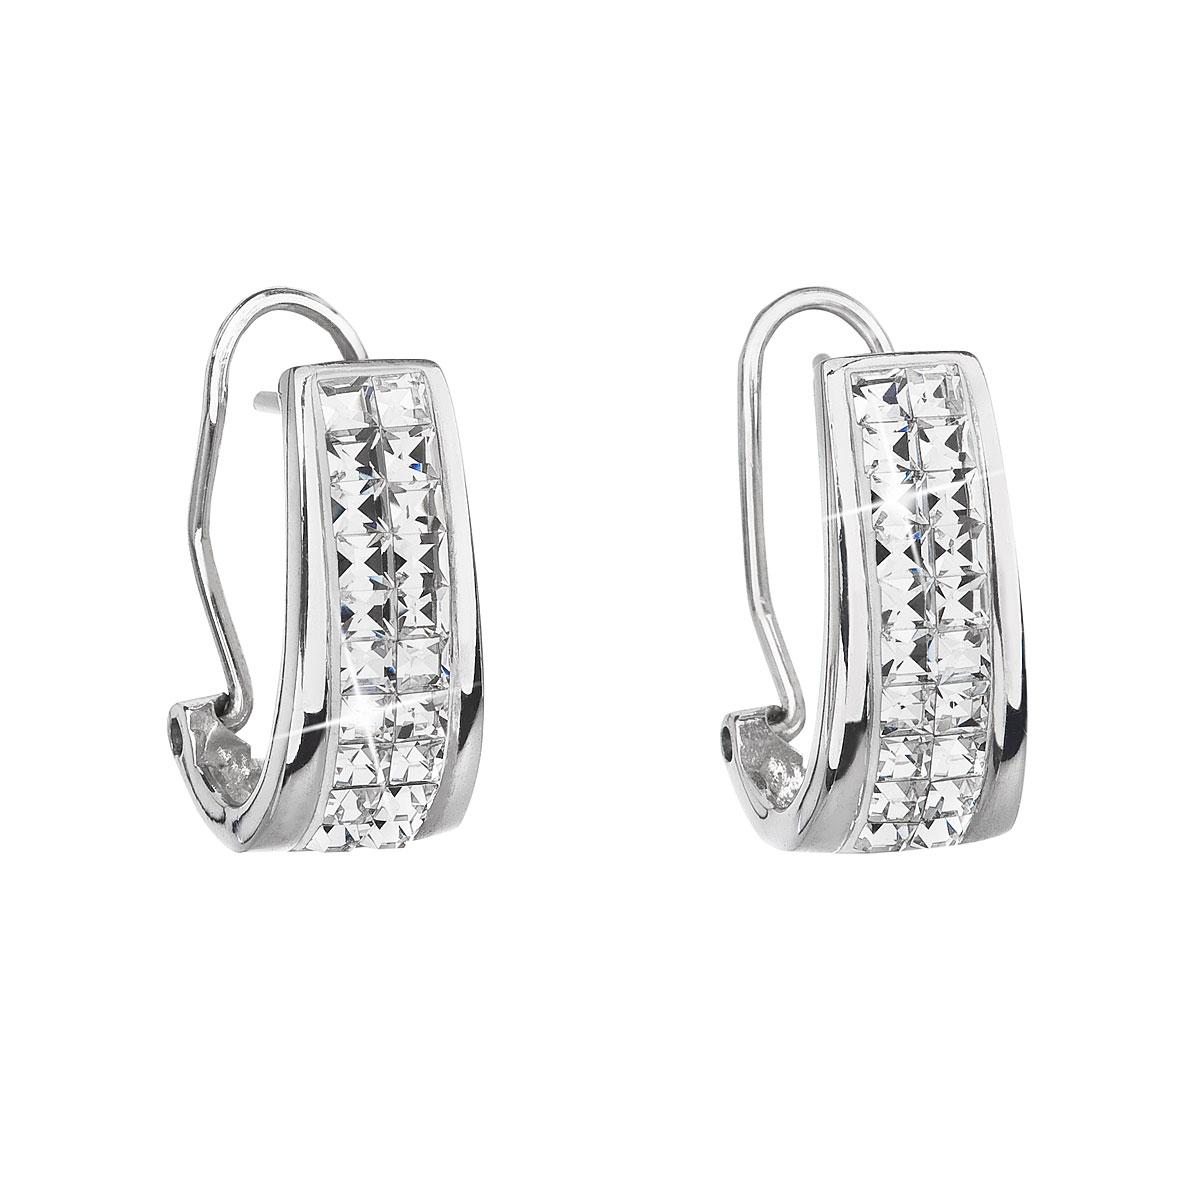 Evolution Group Stříbrné náušnice klipsy s krystaly Swarovski bílý půlkruh  31172.1 c9e8a6c26b8